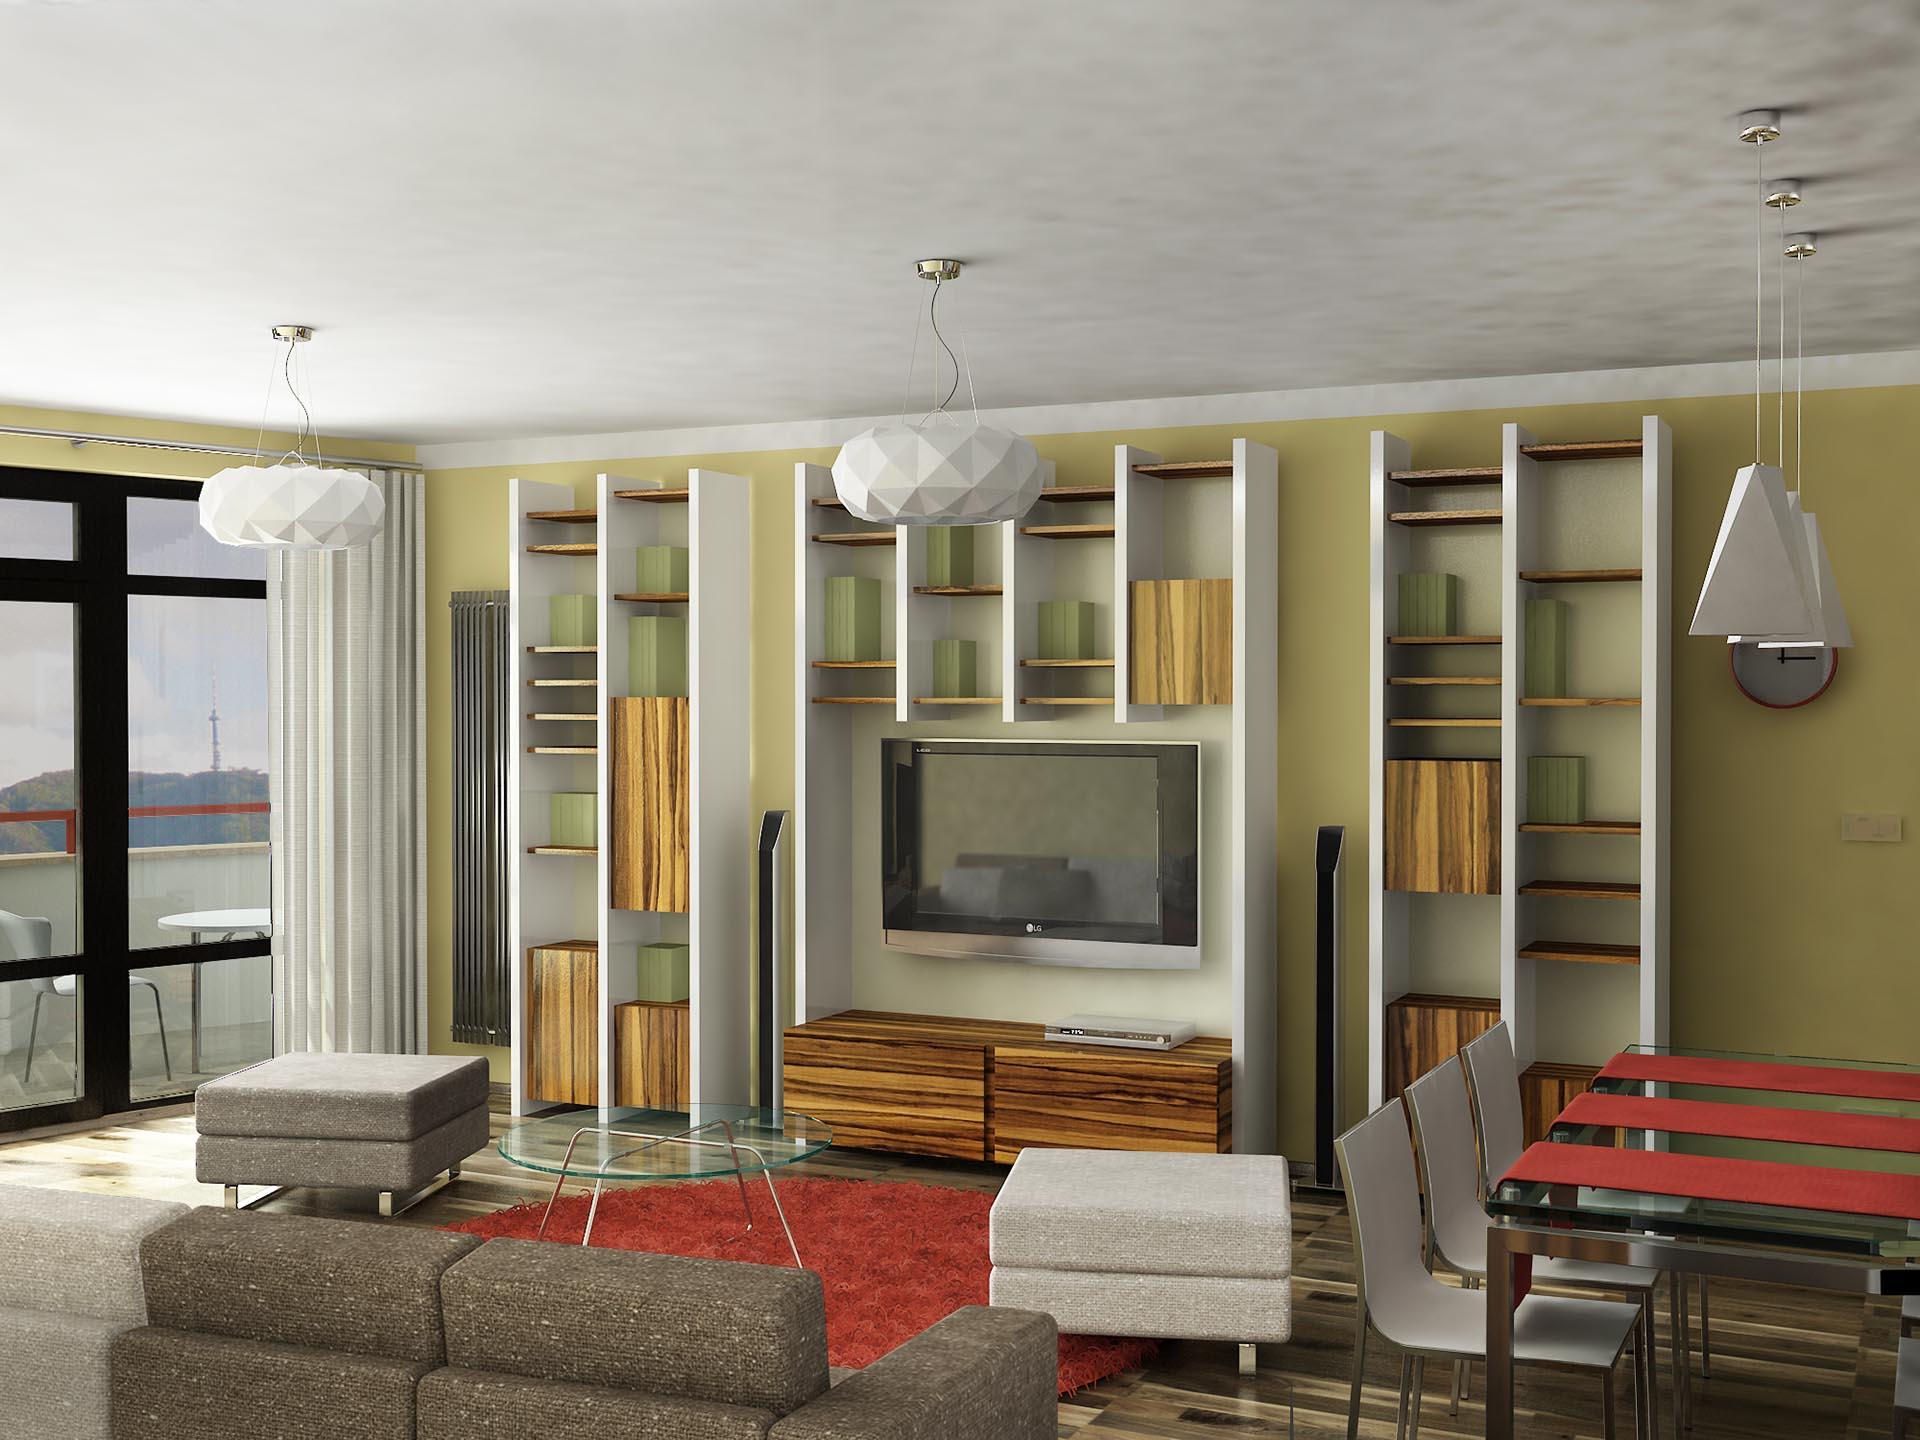 Interior Visulchevi 01